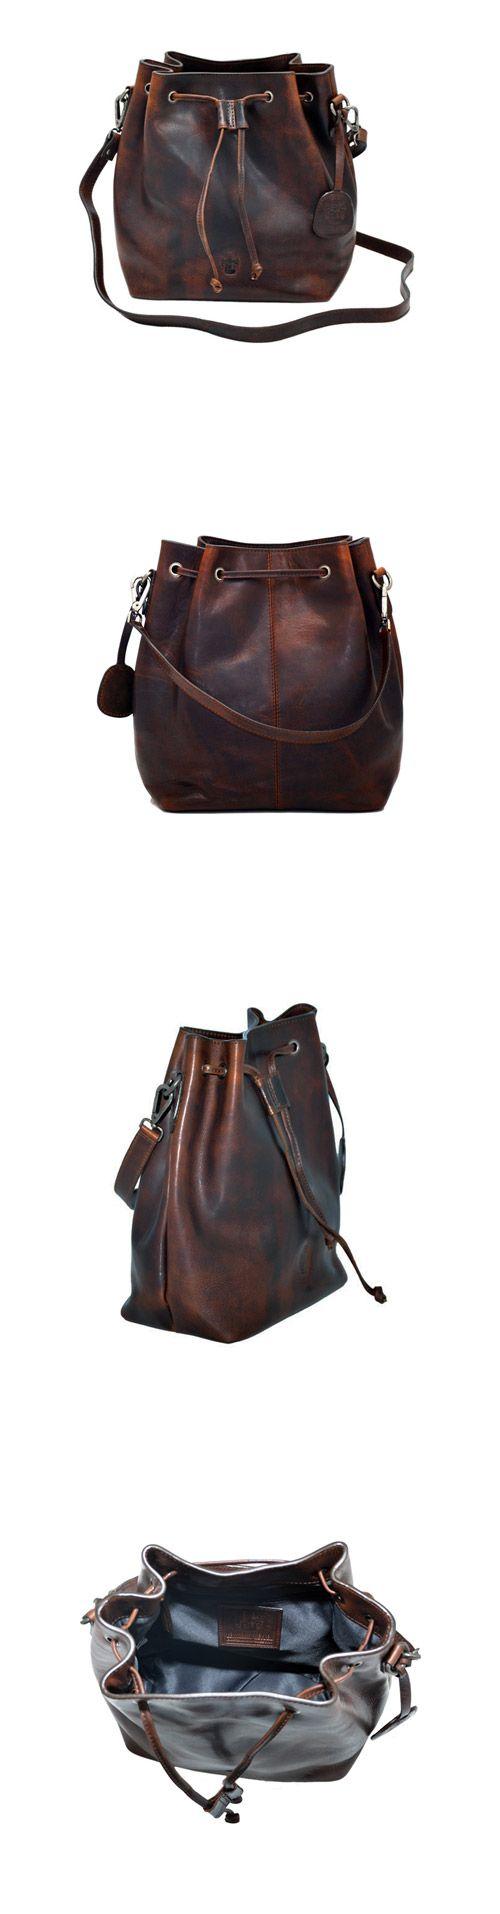 Leonhard Heyden, Lucca Hobo Bag.  See more on Pickandbloom